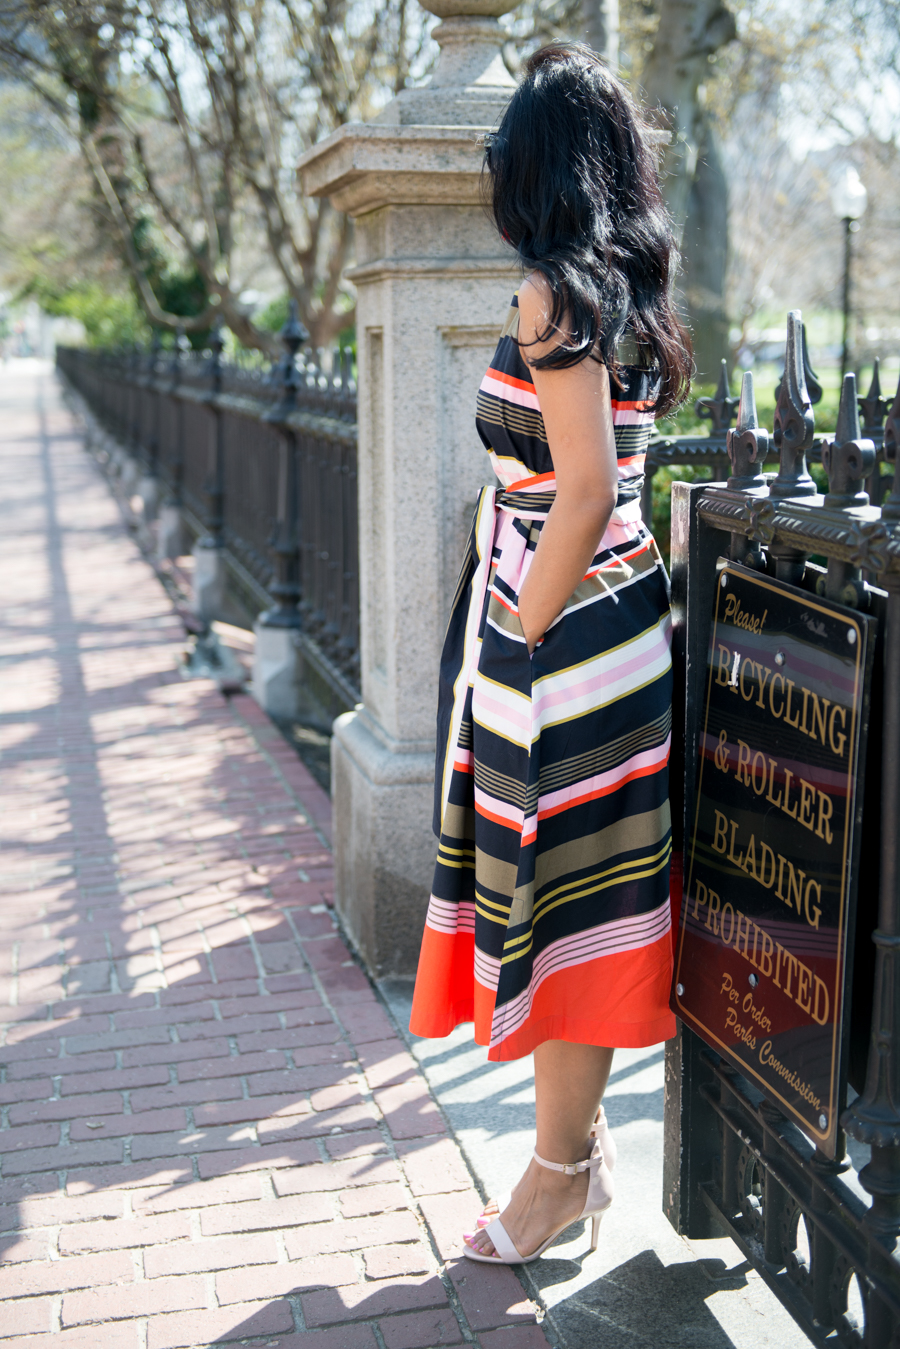 spring fashion, spring dress, feminine style, curvy, aline, pearshape, brunch dress, wedding guest dress, petite fashion, petite style, girly, candy colors, ann taylor, tassel, spring dresses